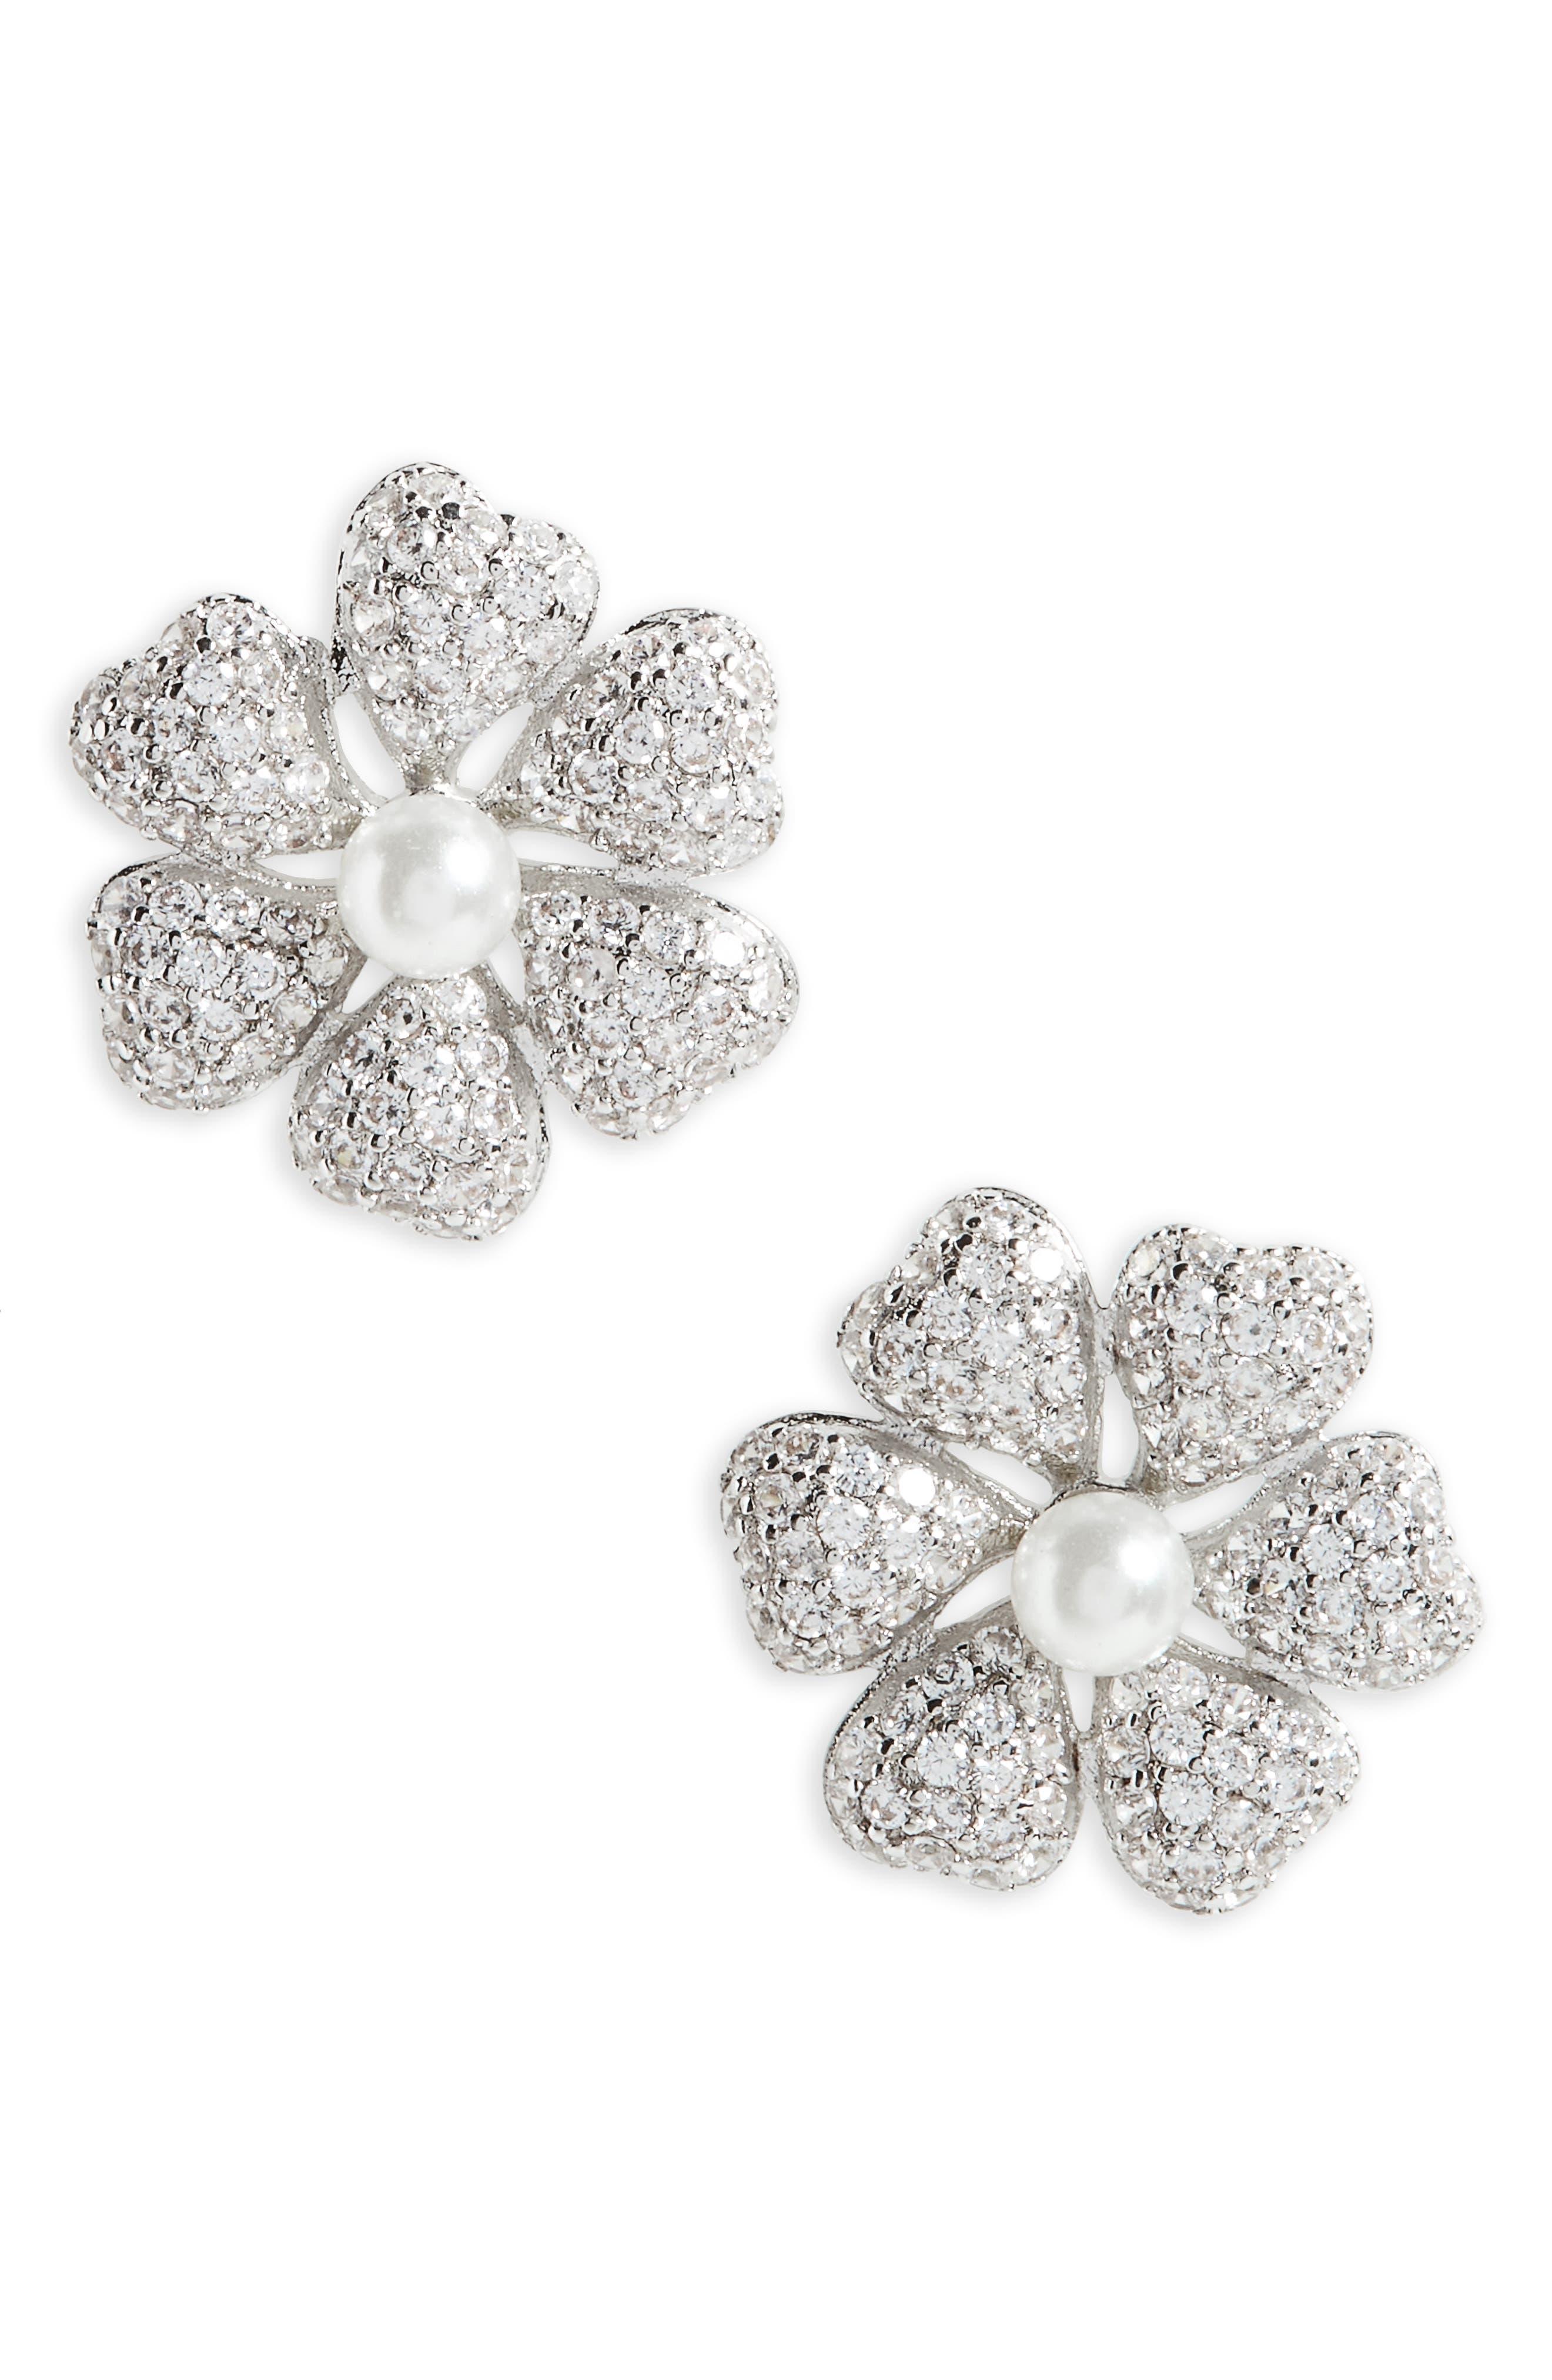 Flower Crystal & Imitation Pearl Stud Earrings,                         Main,                         color, Ivory Pearl / Silver